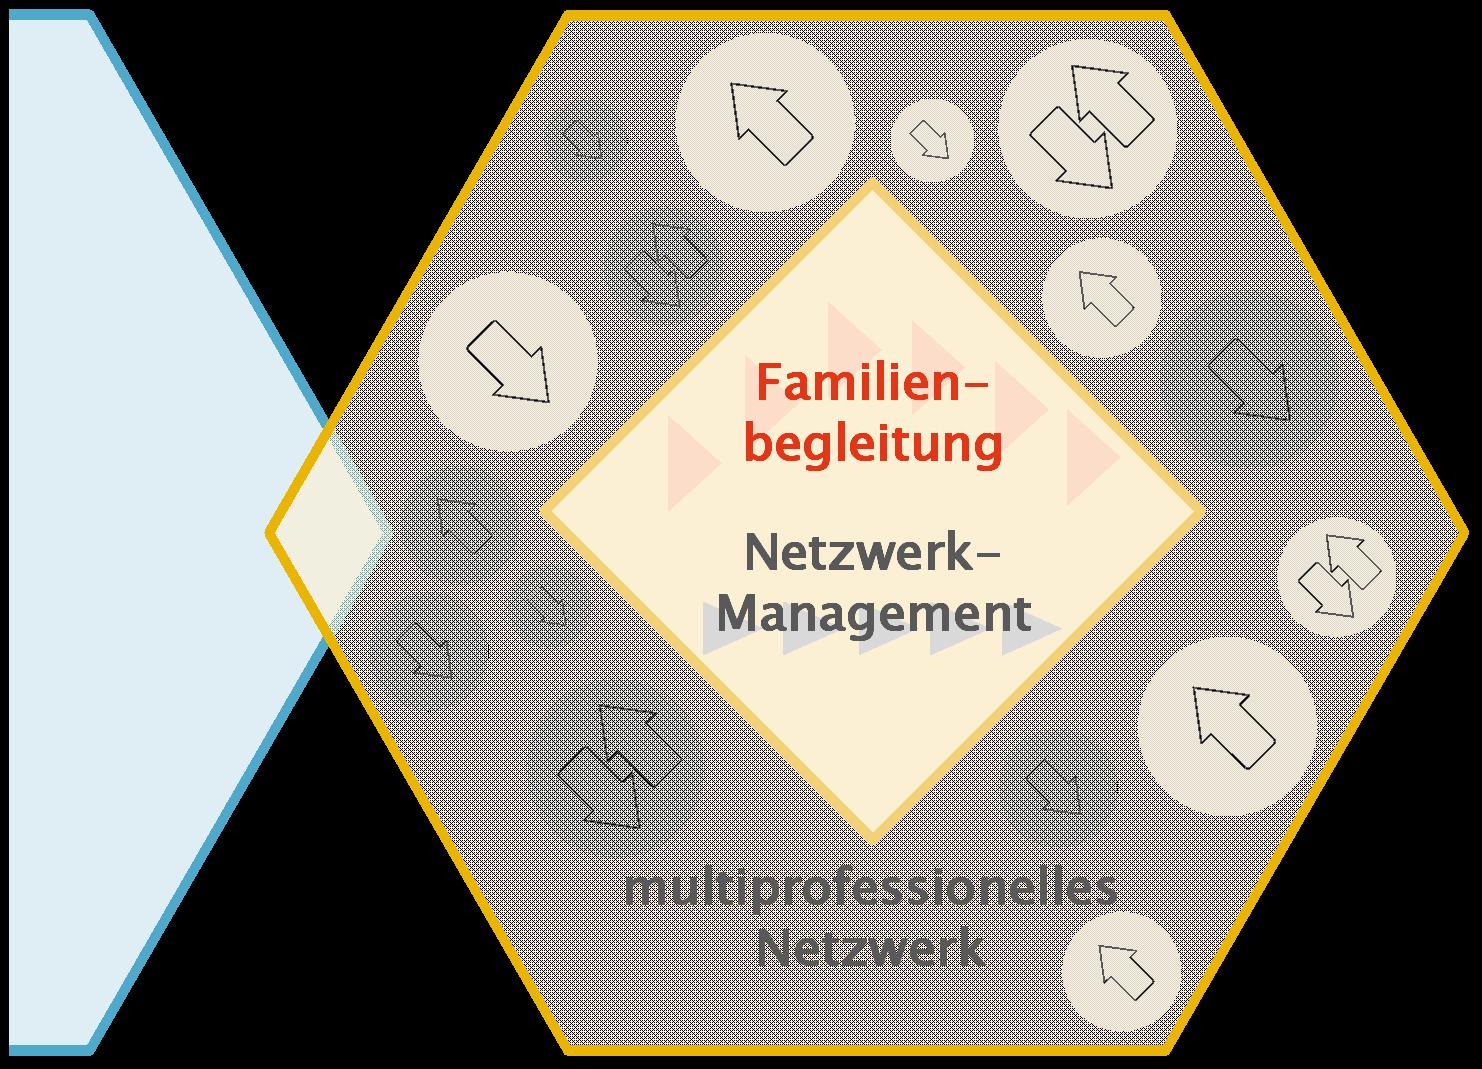 Grafik: Regionale Frühe-Hilfen-Netzwerke